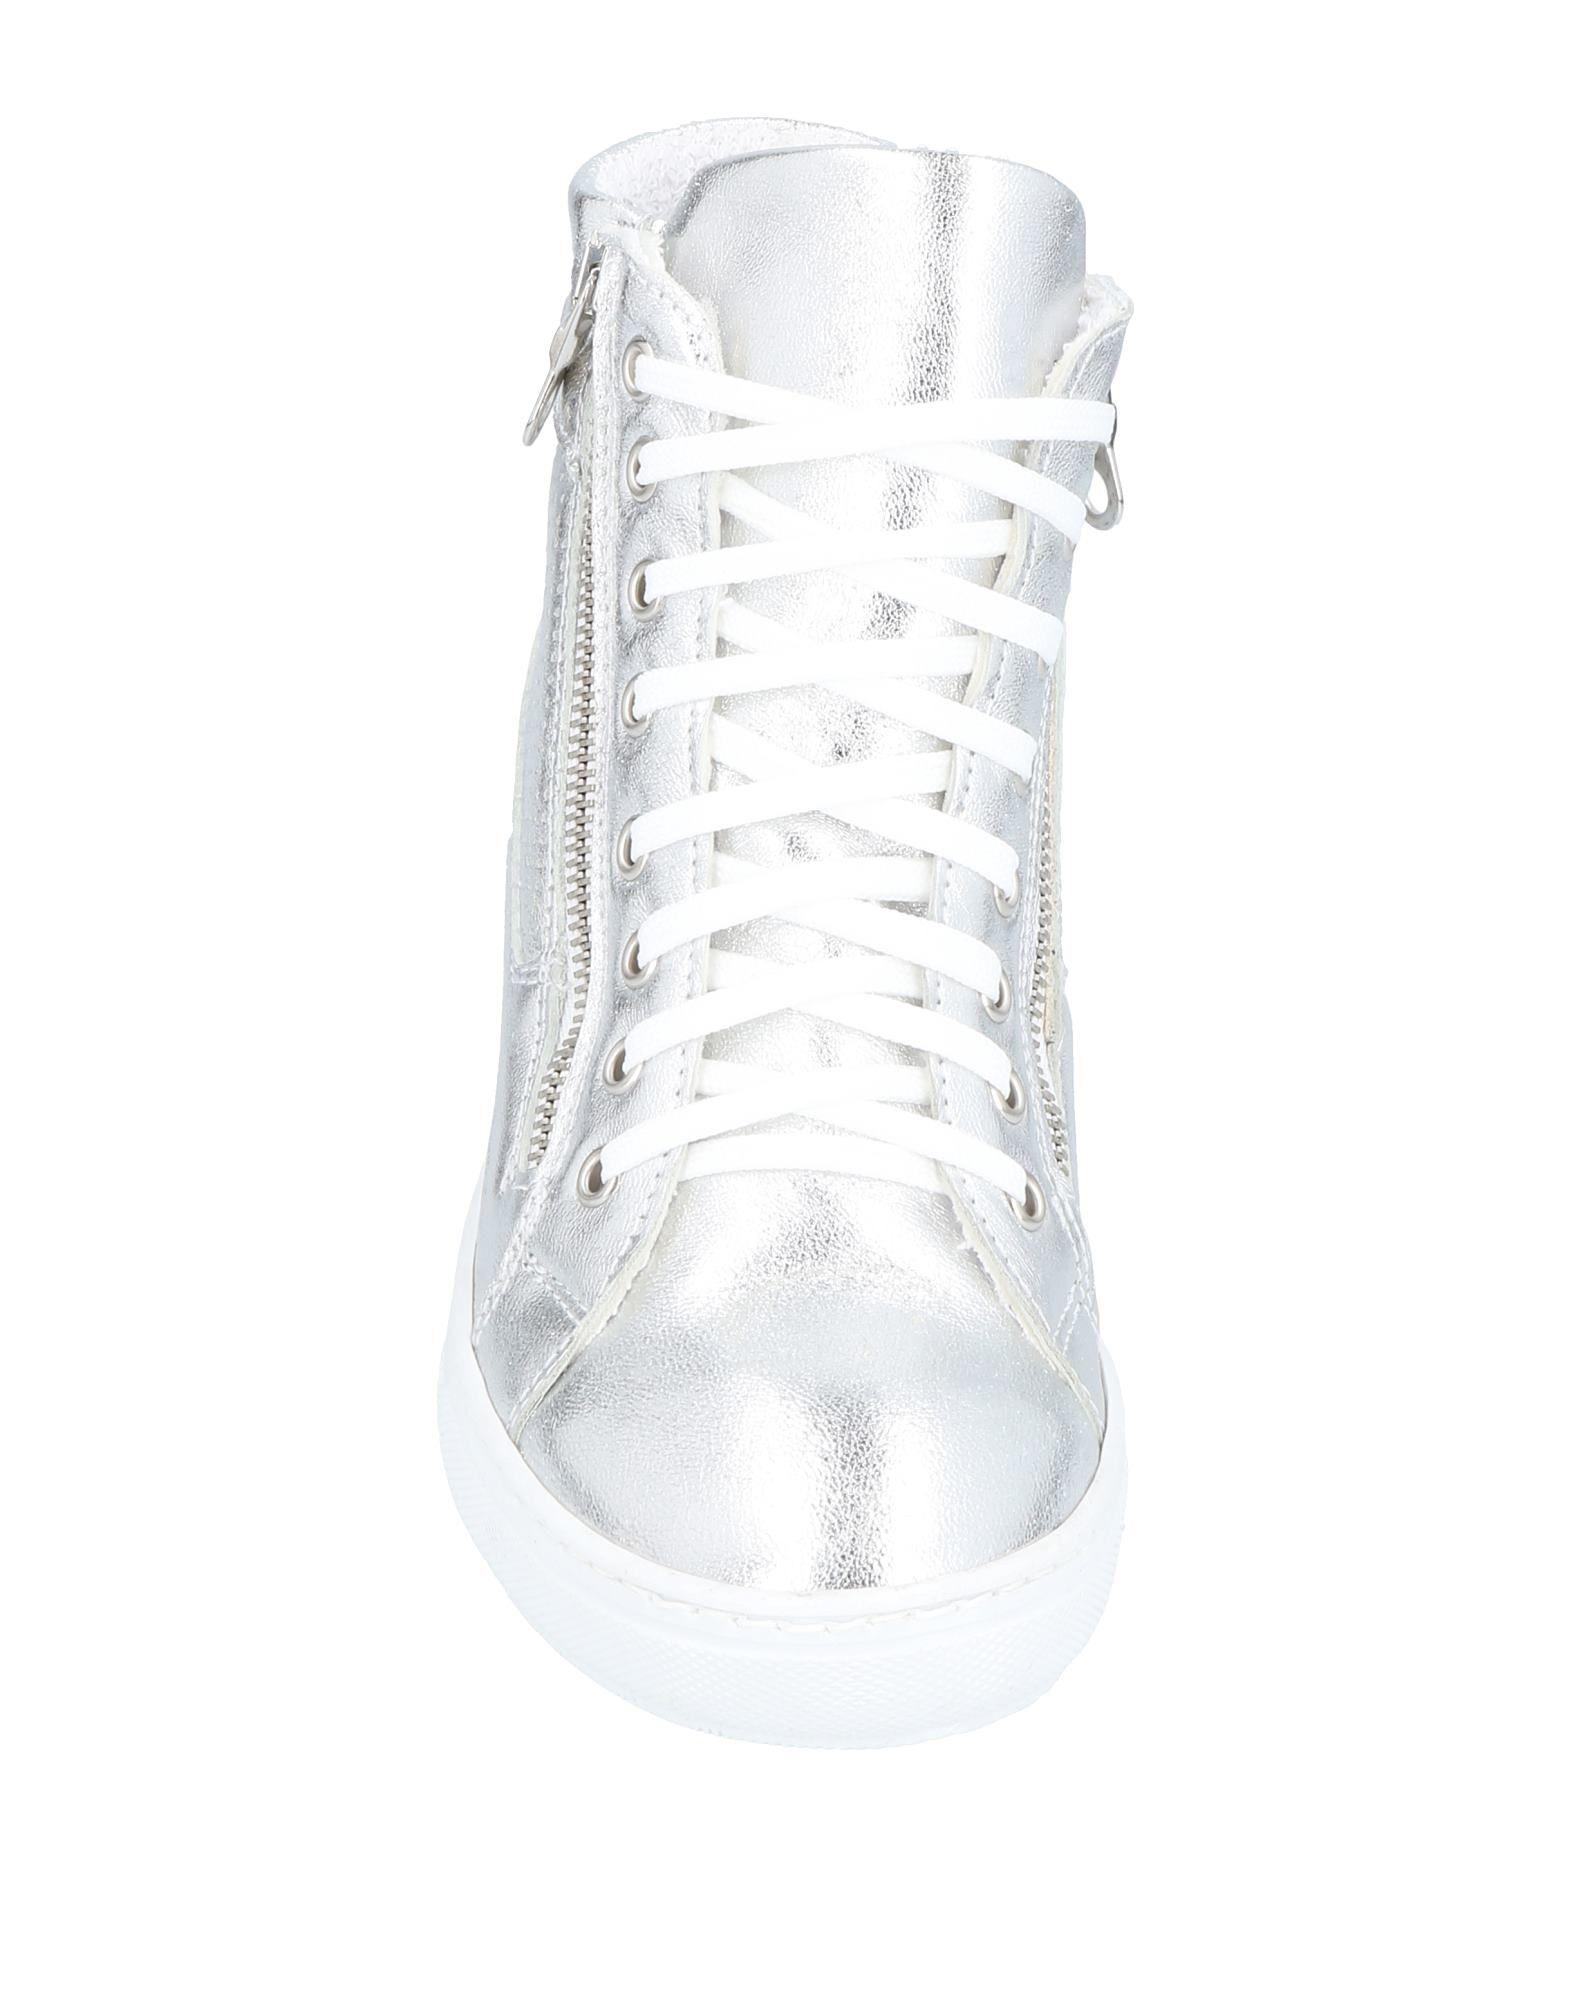 Geneve Sneakers Damen  beliebte 11467711MX Gute Qualität beliebte  Schuhe 7bf5c4